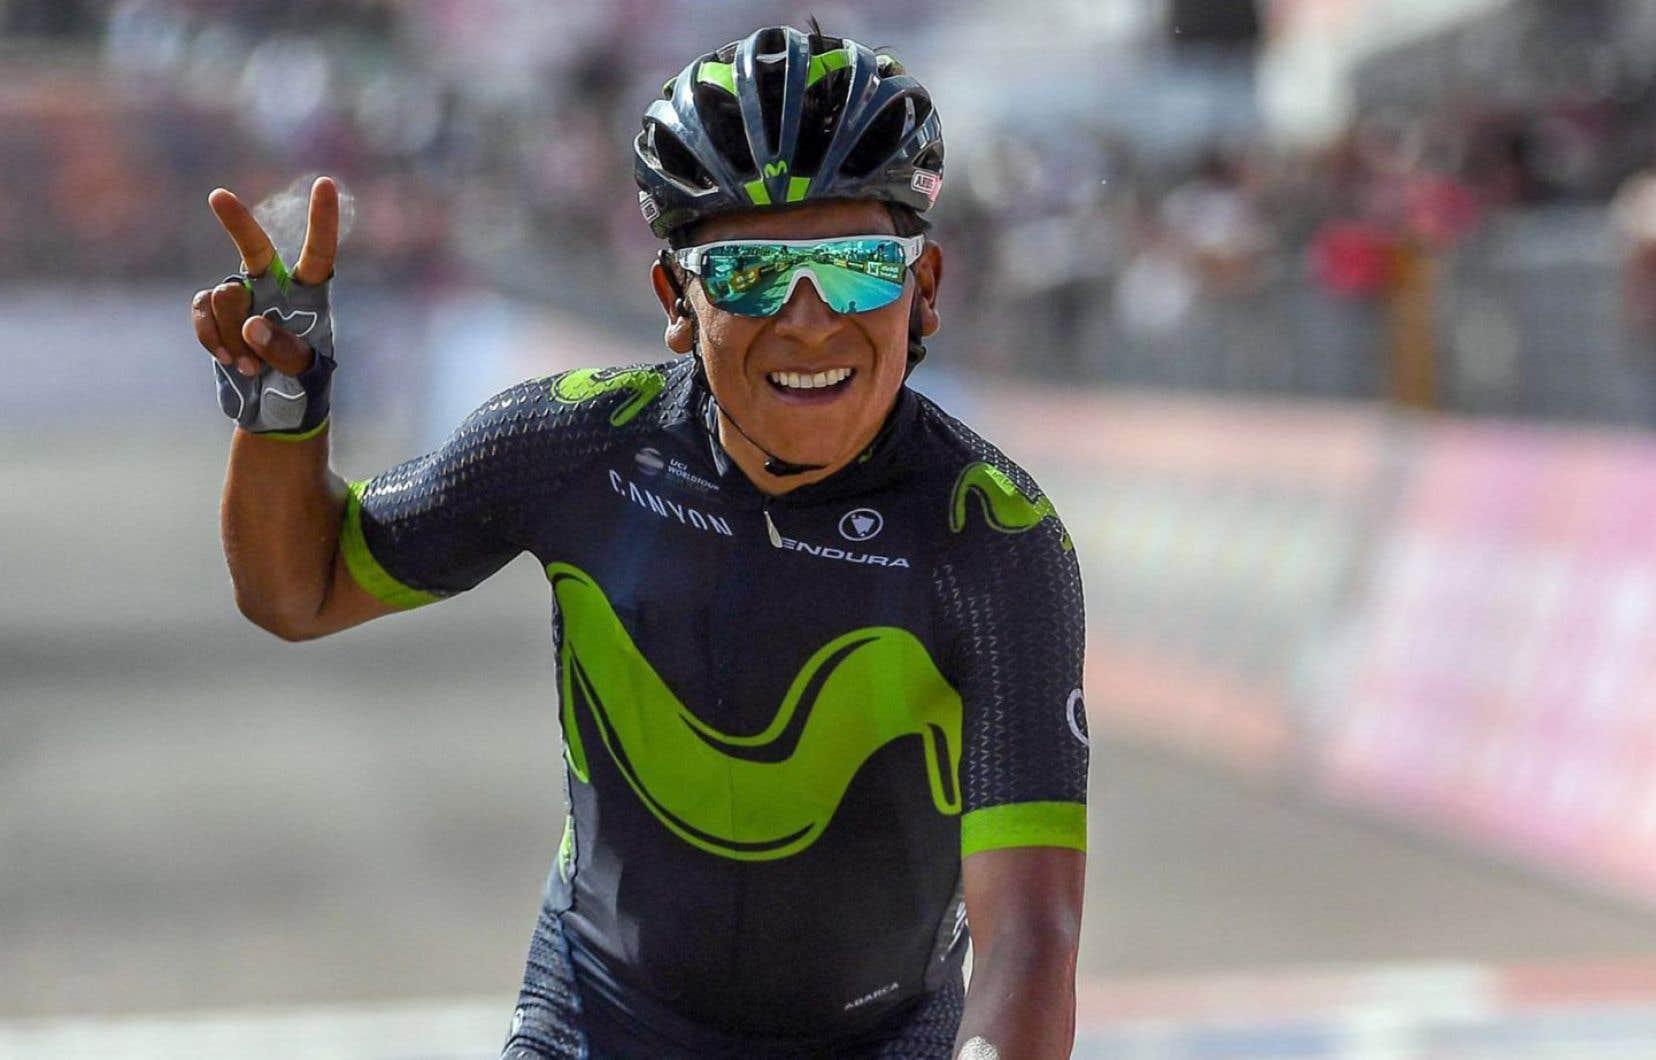 Le cyclistecolombien Nairo Quintana